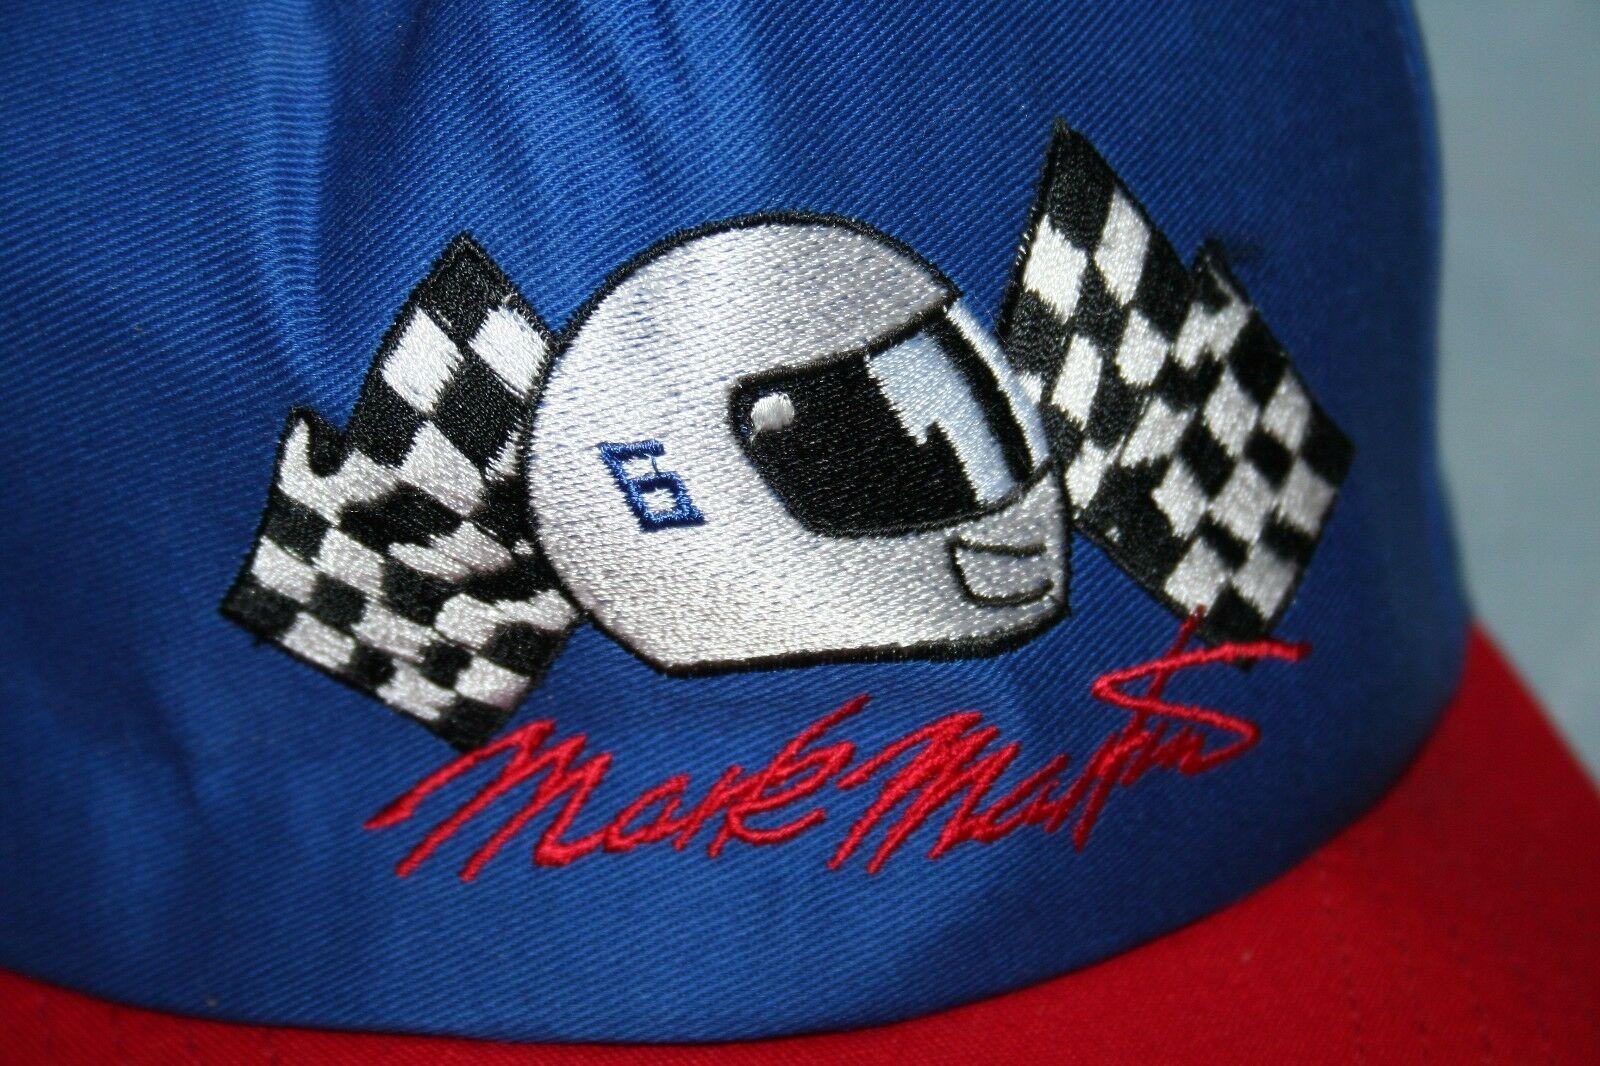 Vintage MARK MARTIN #6 Racing Blue Red Snapback HAT CAP Made In USA NASCAR image 2